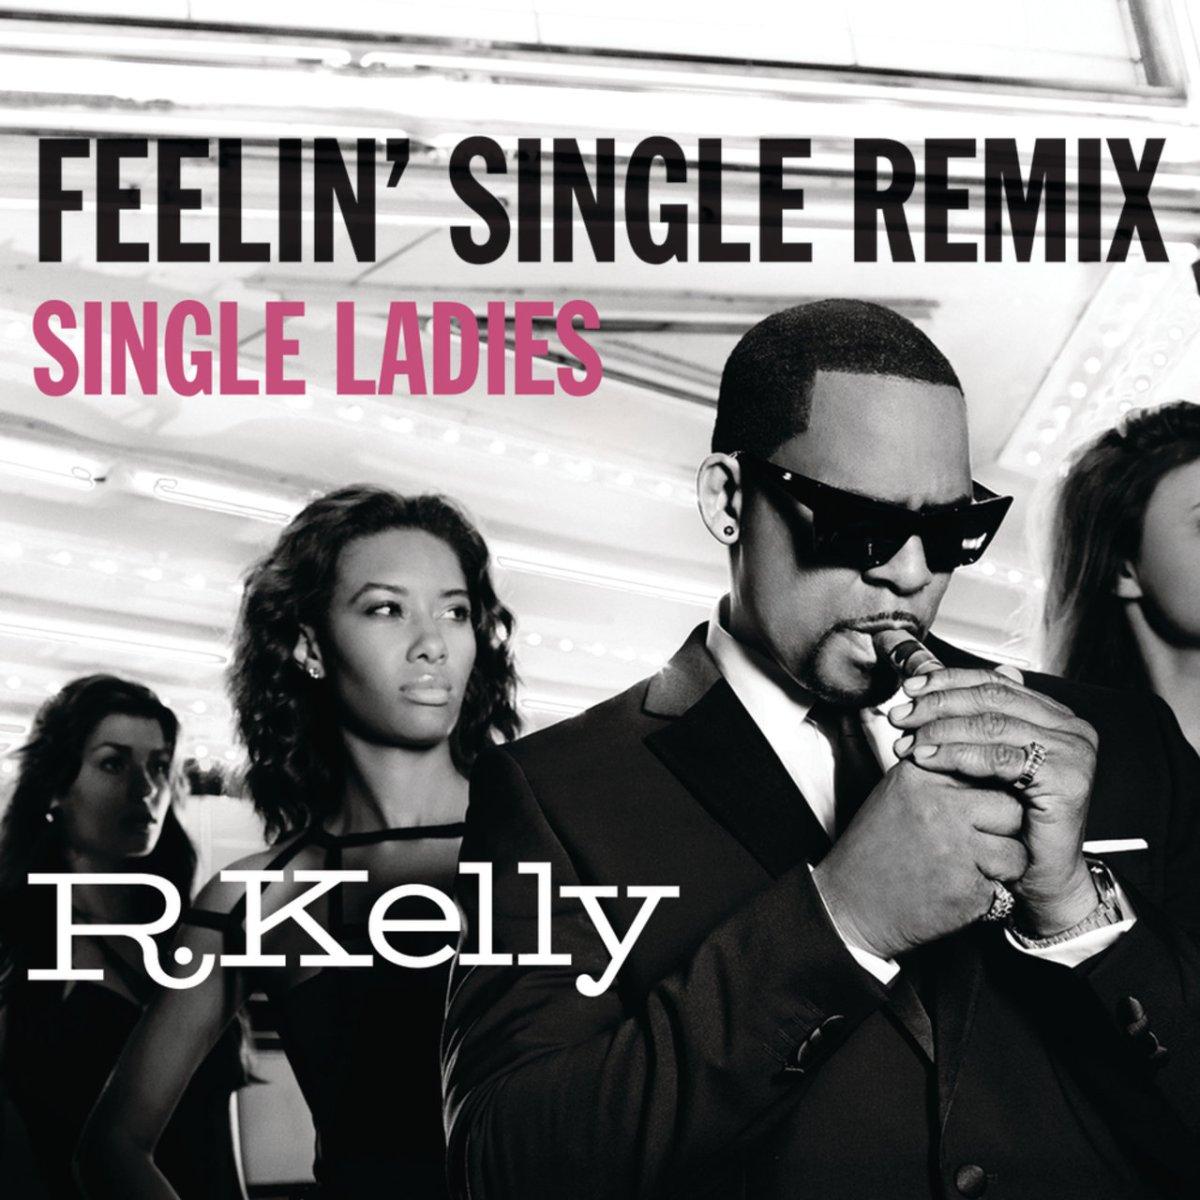 R. Kelly - Feelin' Single (Remix - Single Ladies) (Cover)